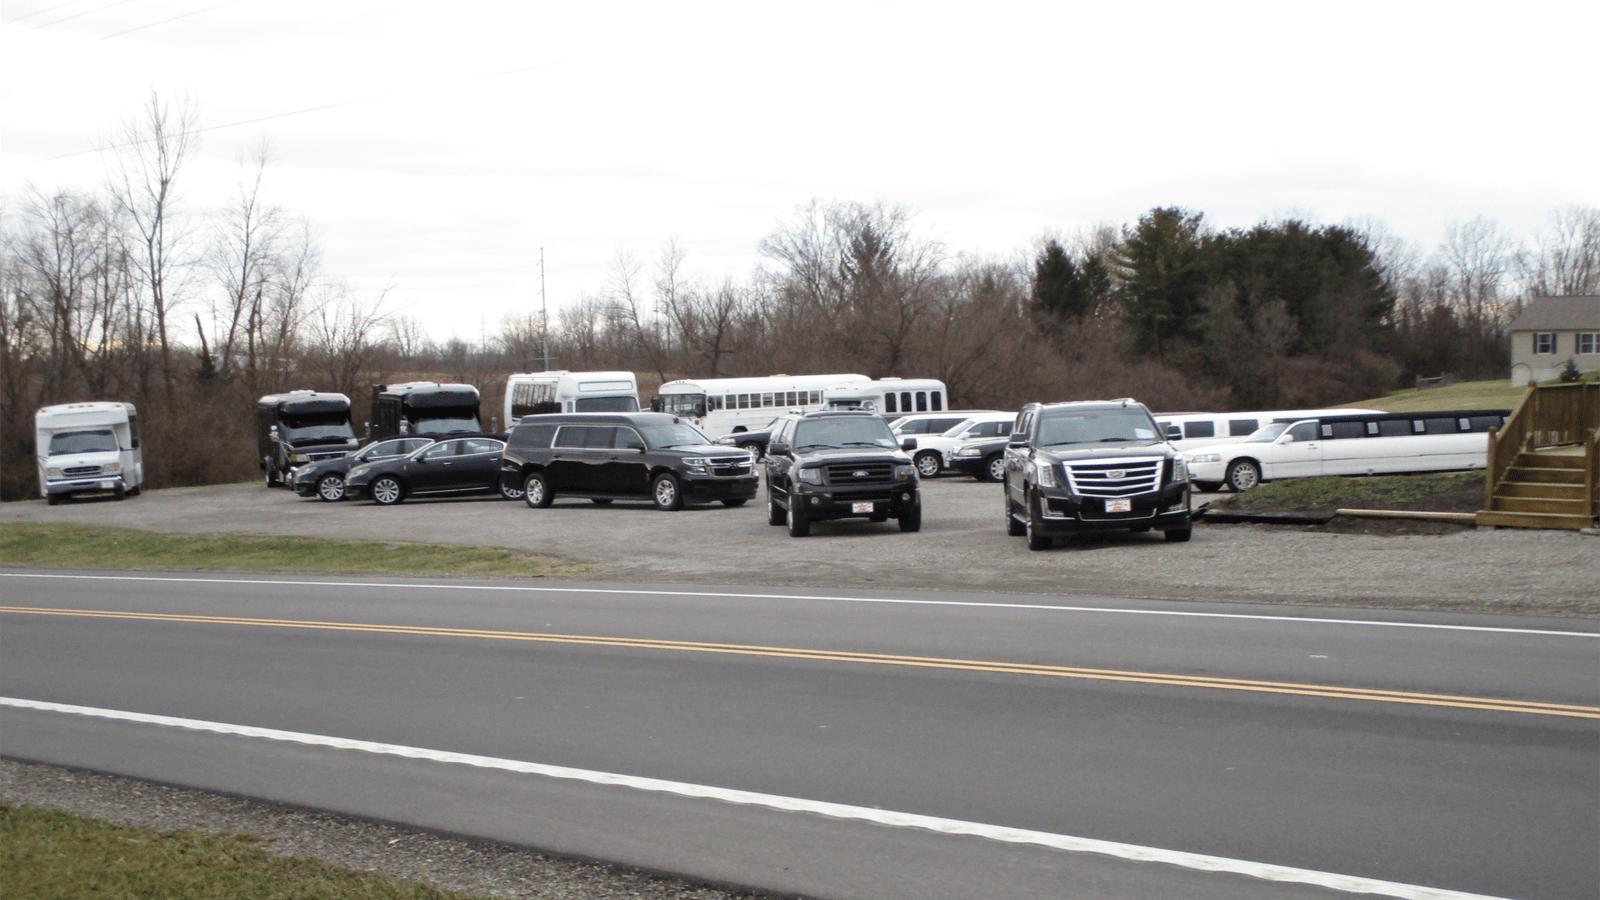 Ohio Limo Limo Party Bus Rentals Executive Transportation